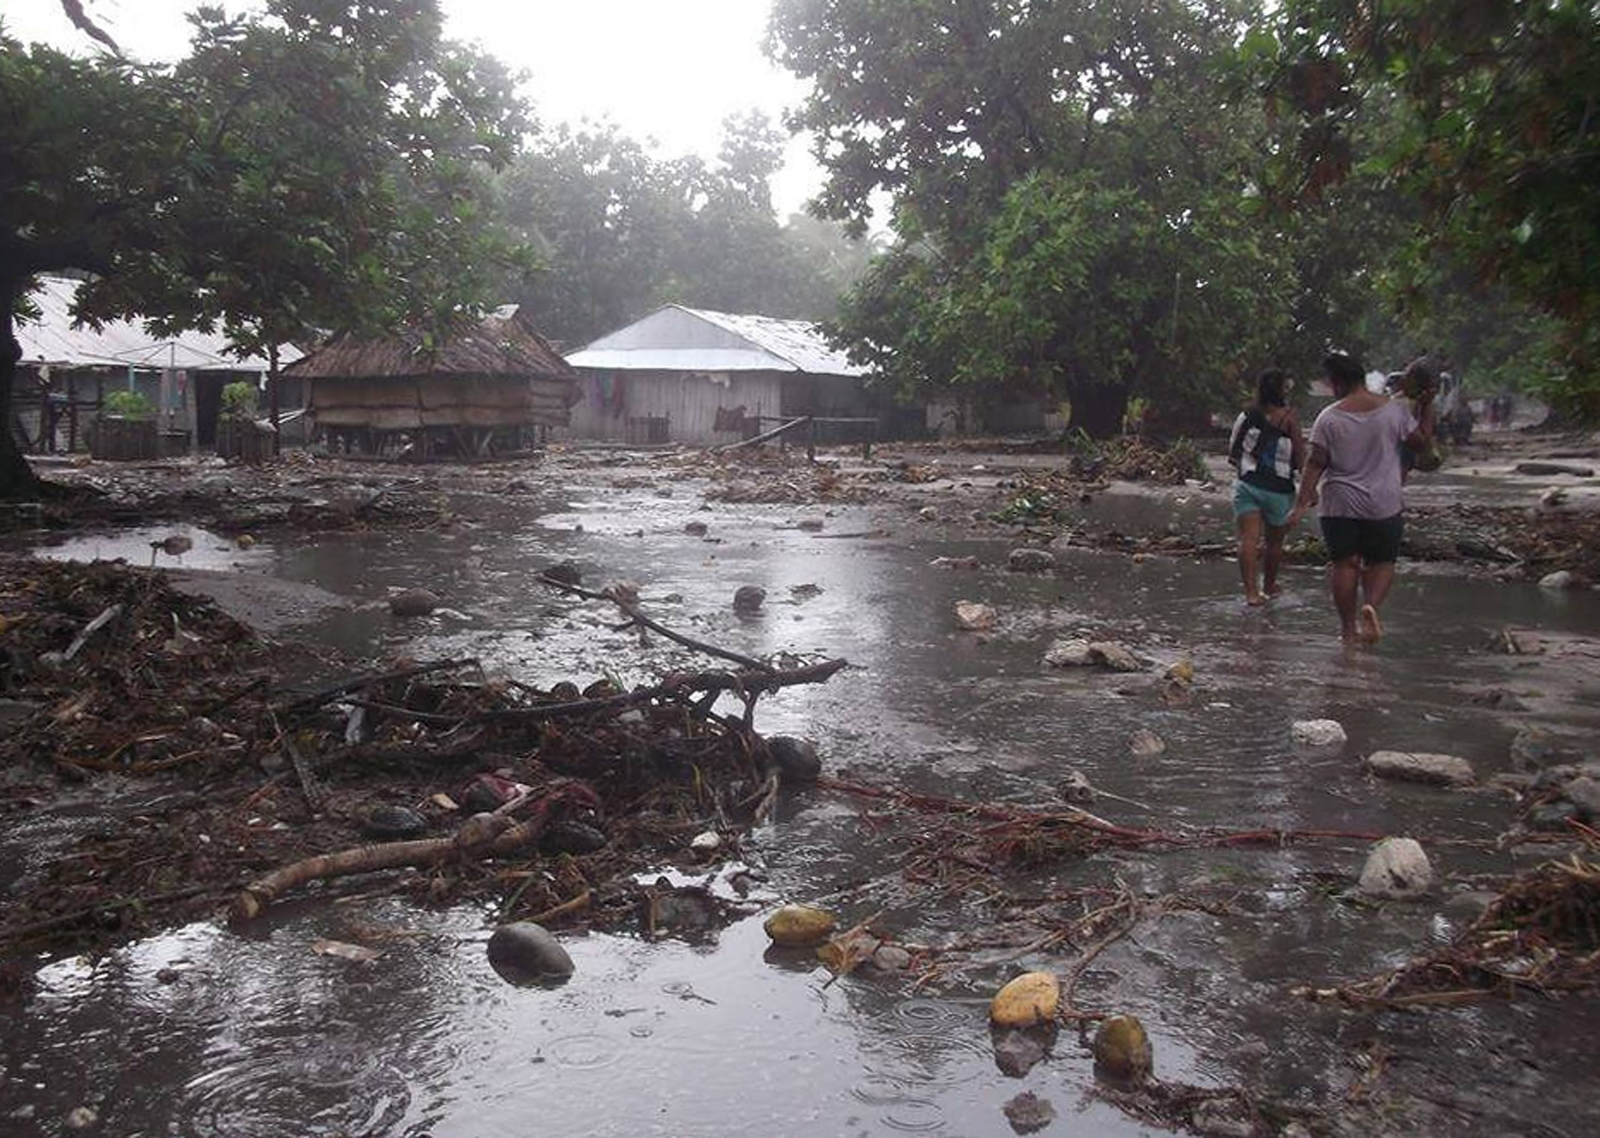 The devastation caused by Cyclone Pam inVanatu